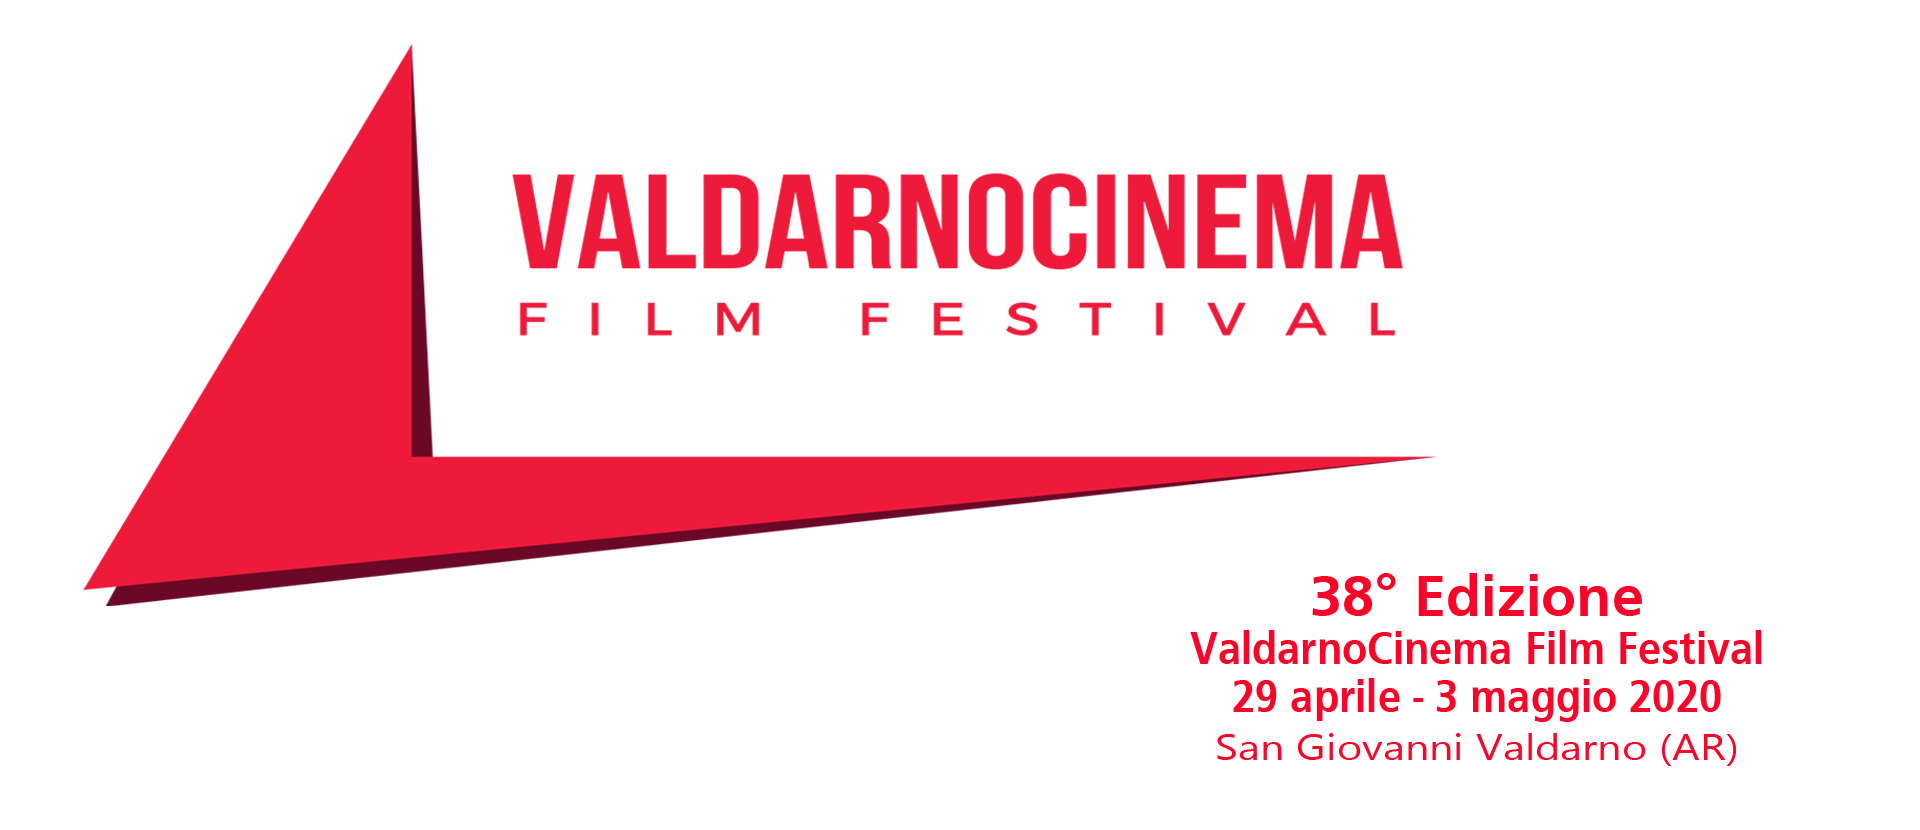 ValdarnoCinema film festival - Festival Cinematografico del Valdarno